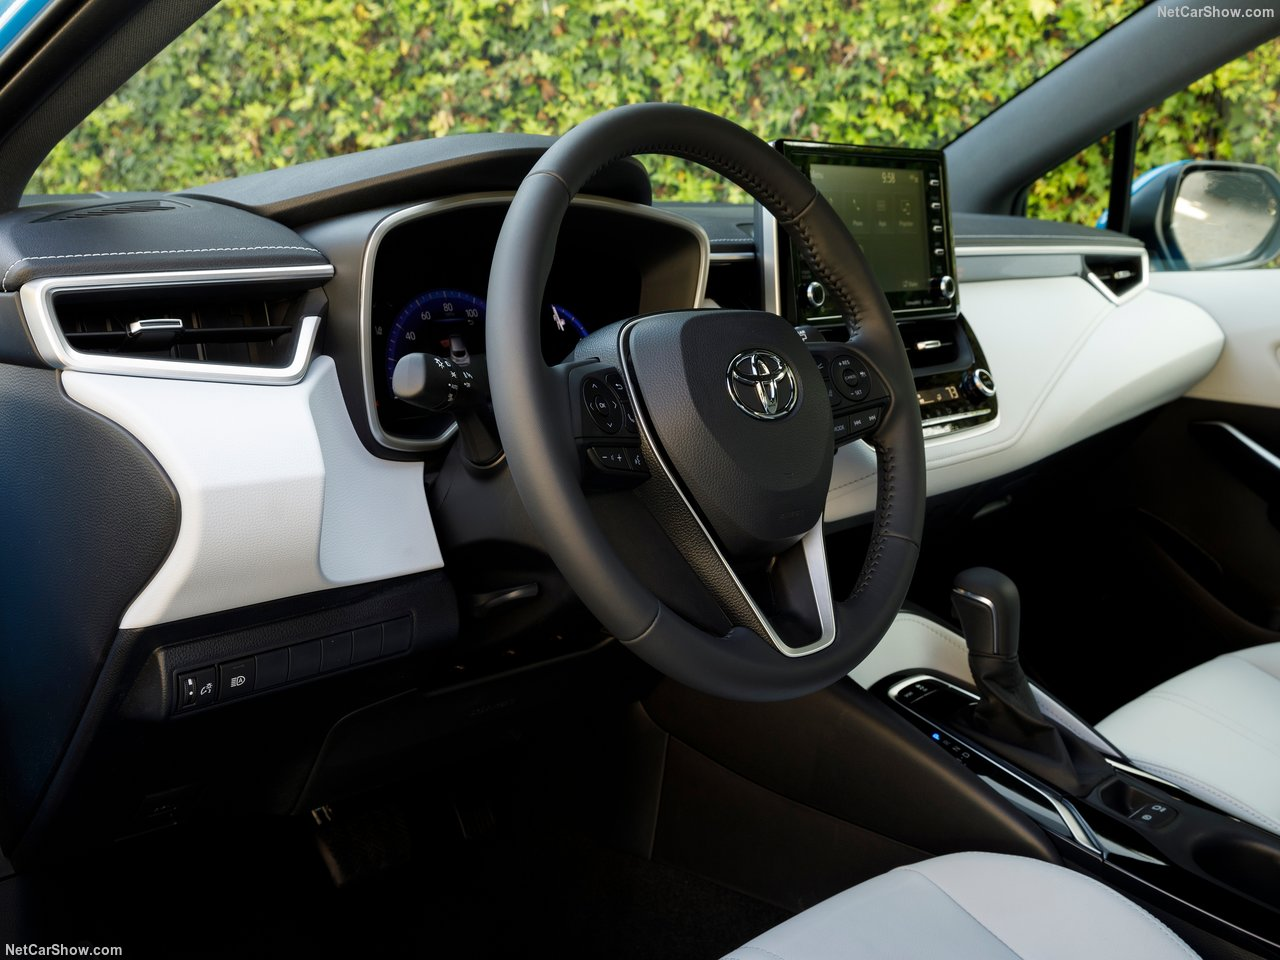 Toyota-Corolla_Hatchback-2019-1280-2e.jpg